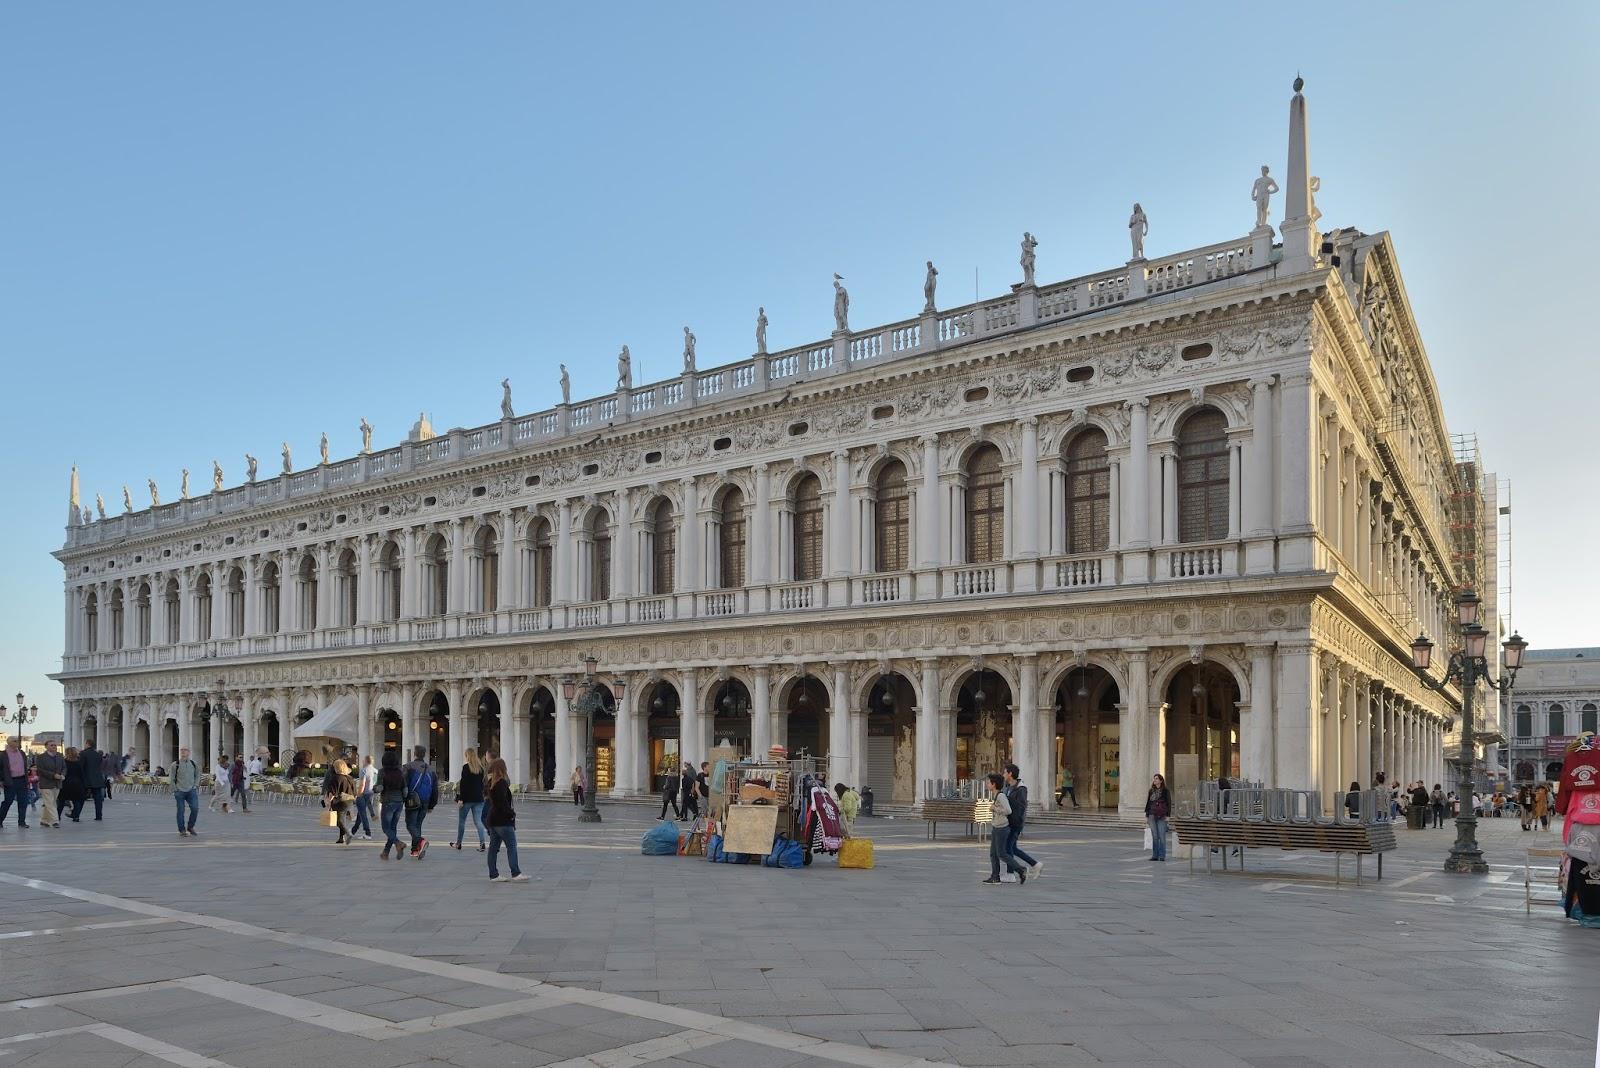 The Libreria Sansoviniana, which houses the Biblioteca Nazionale Marciana, is considered Sansovino's masterpiece